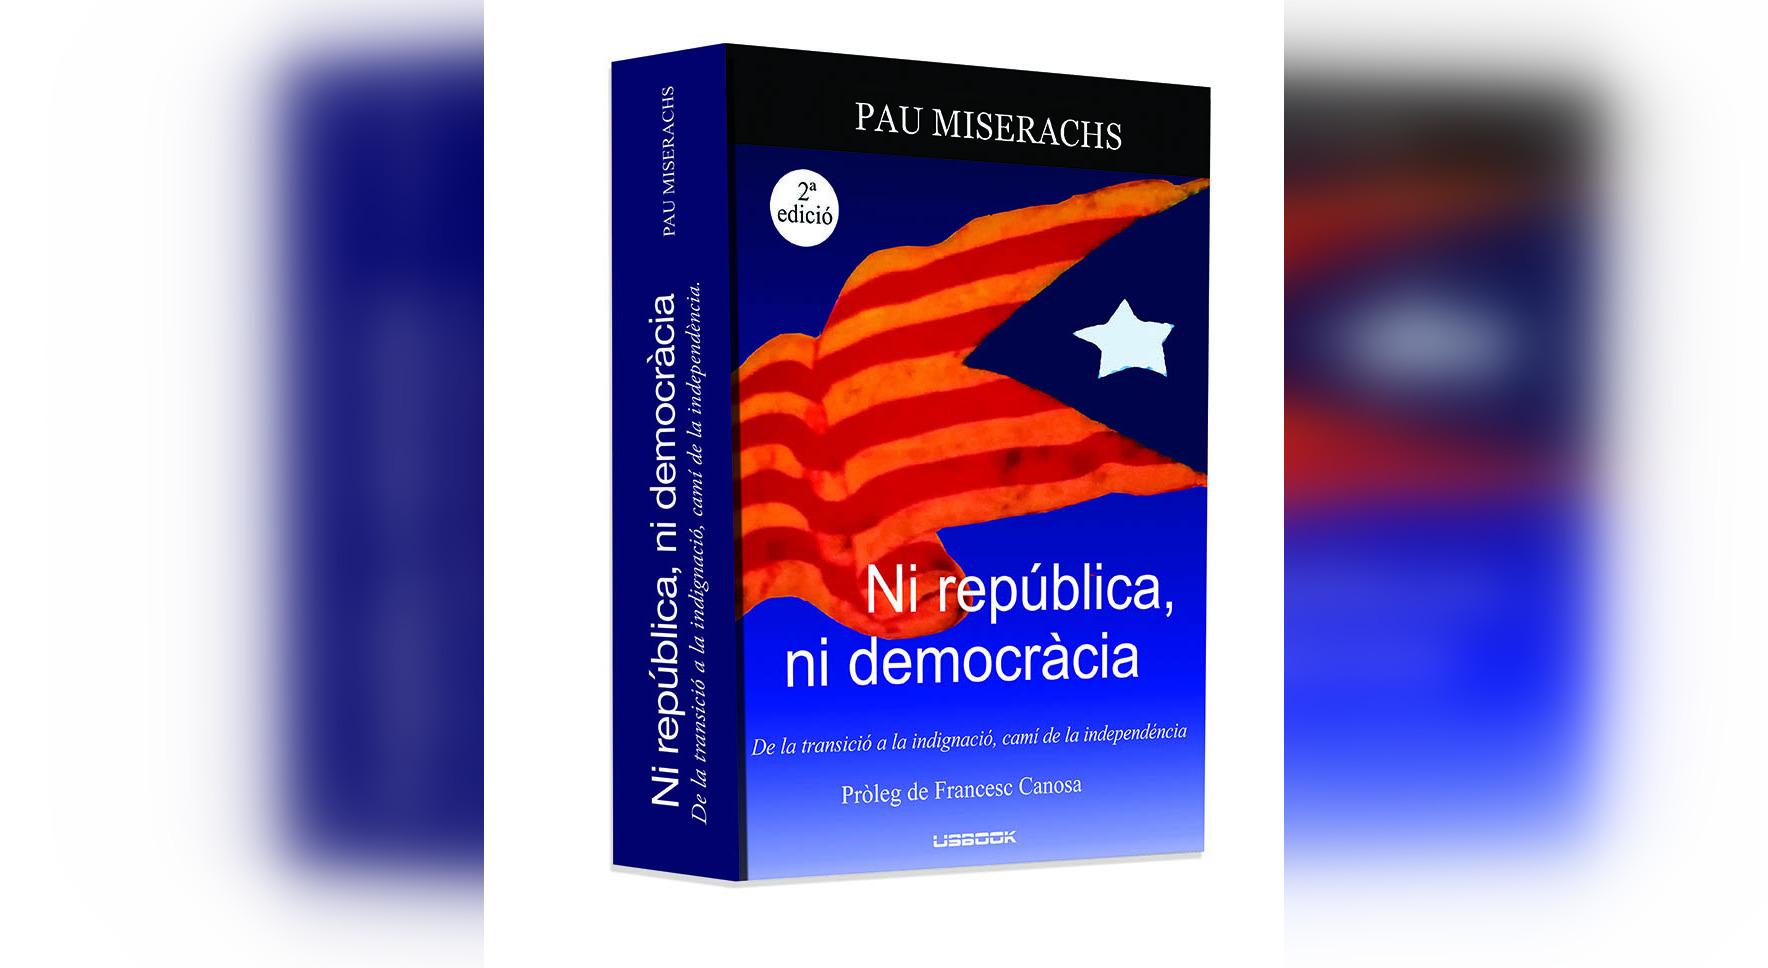 'Ni república, ni democràcia', llibre de Pau Miserachs